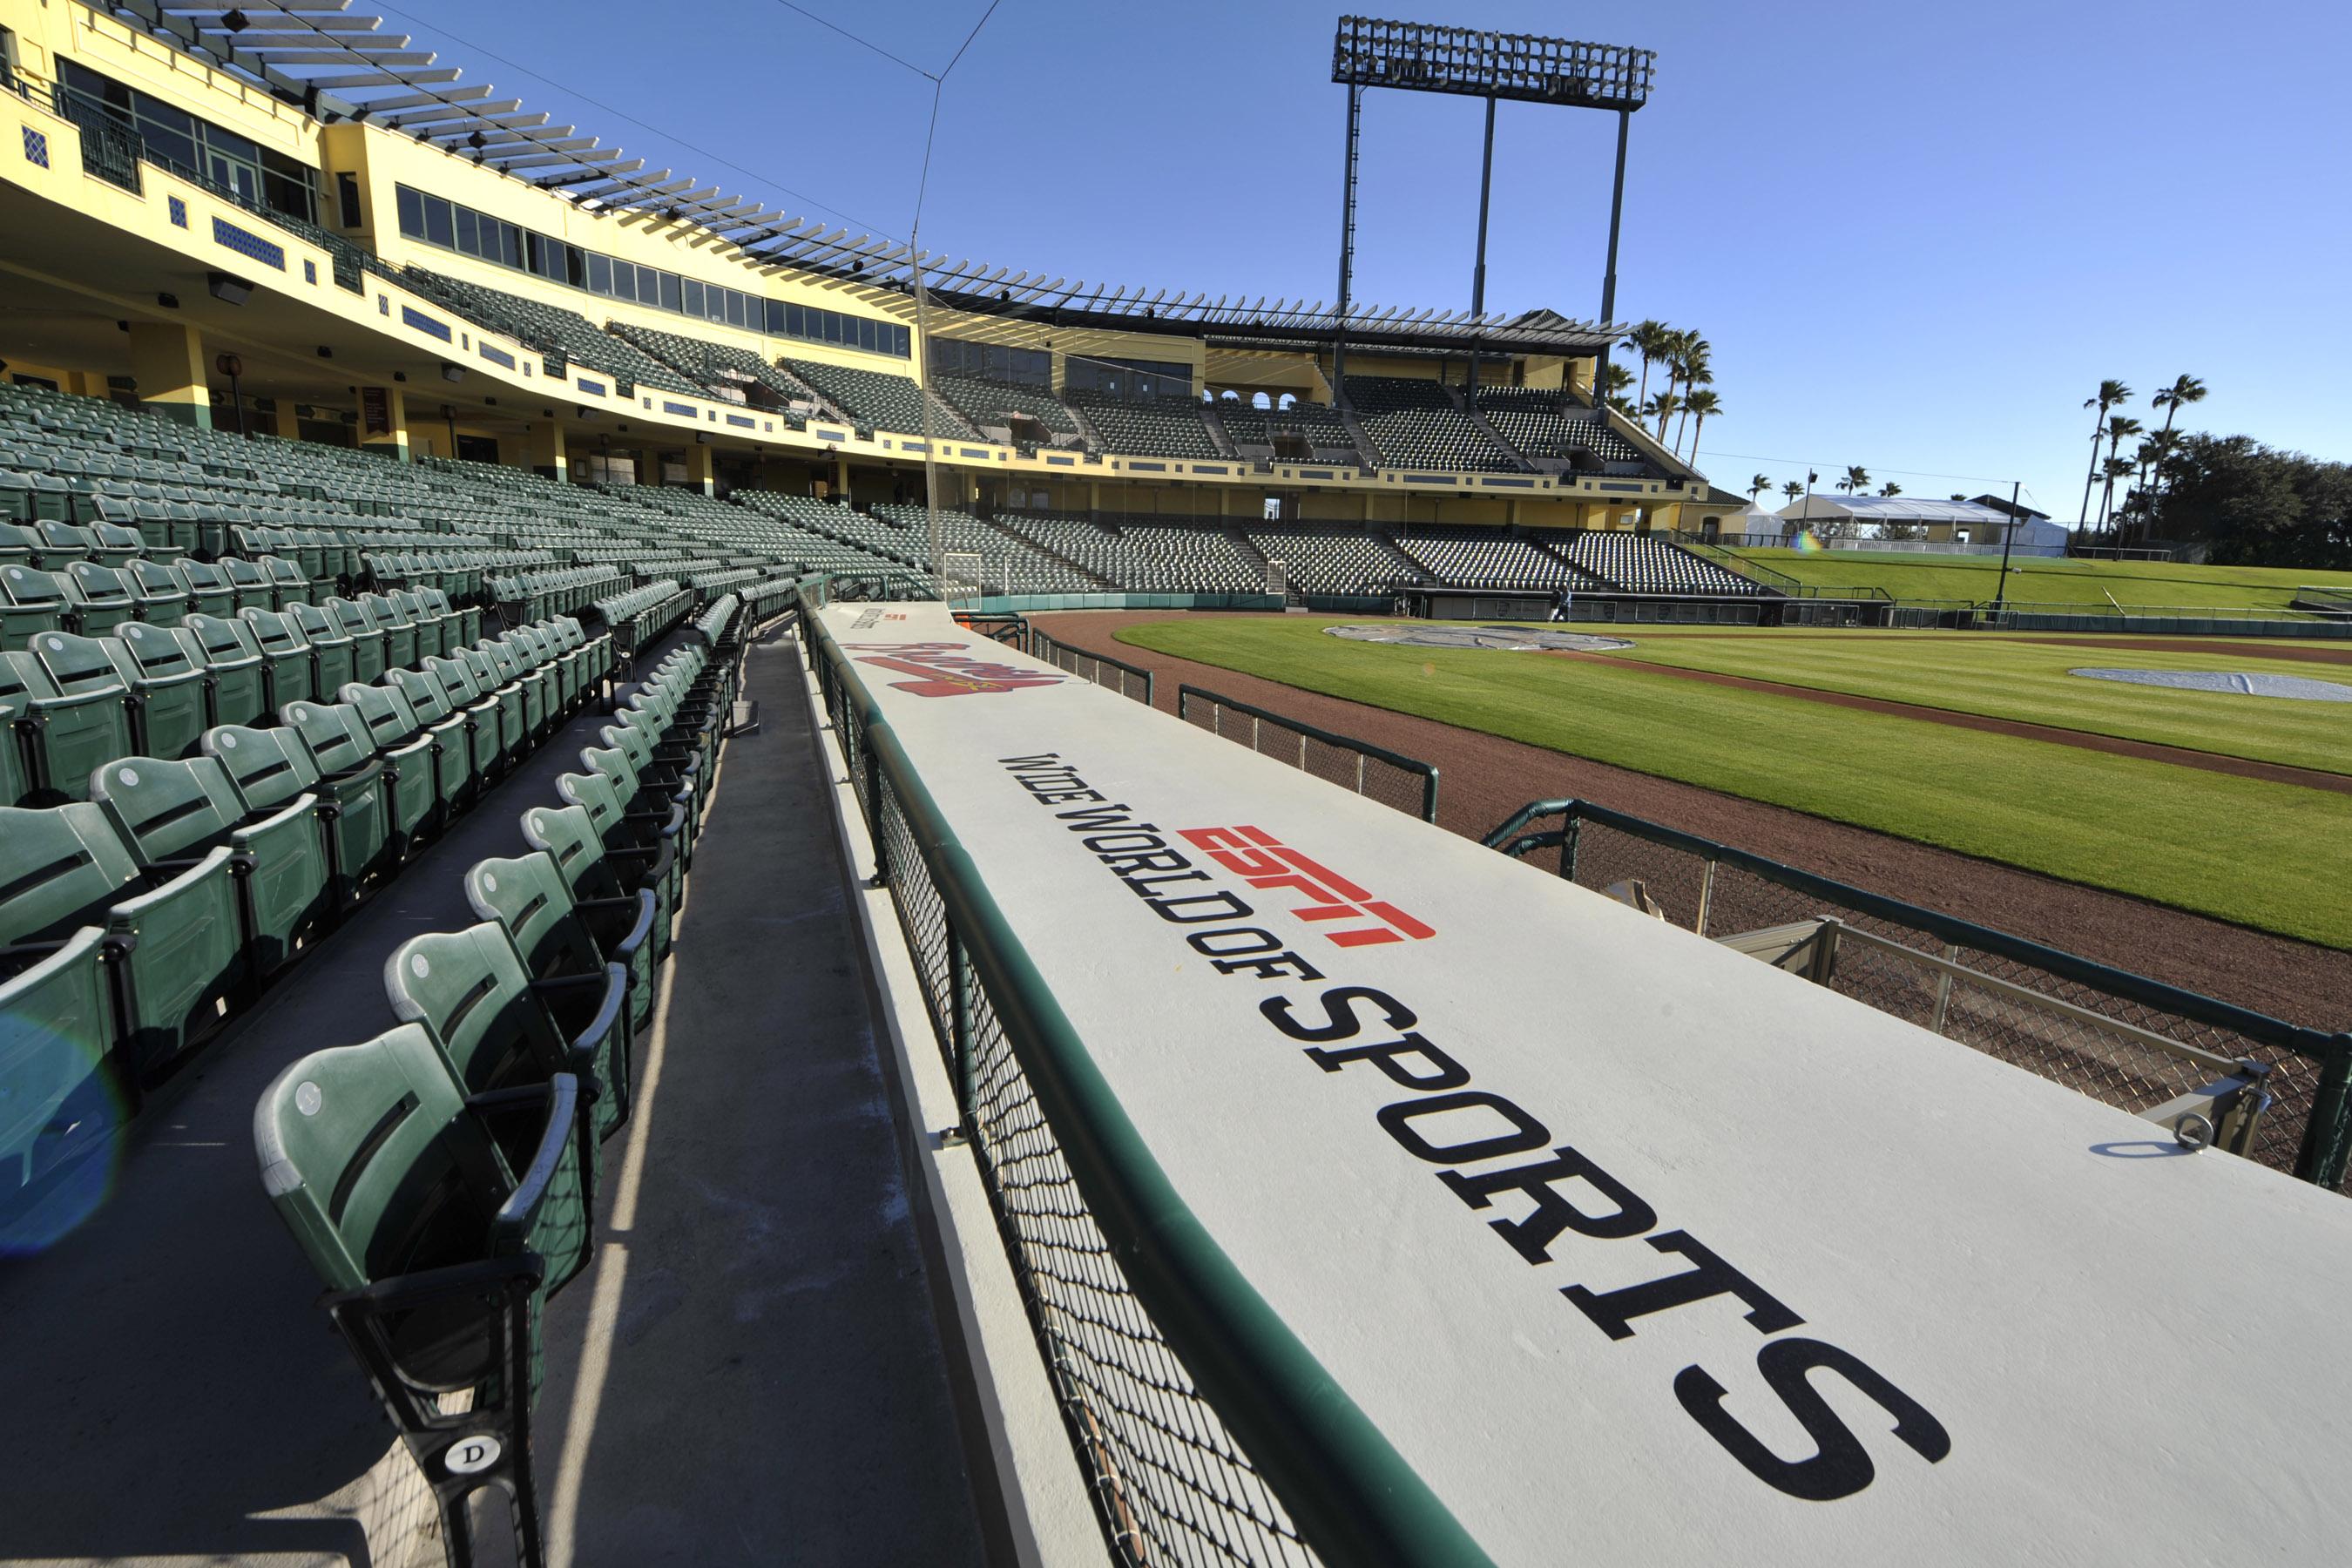 Atlanta Braves Spring Training Games Get Underway Today At Espn Wide